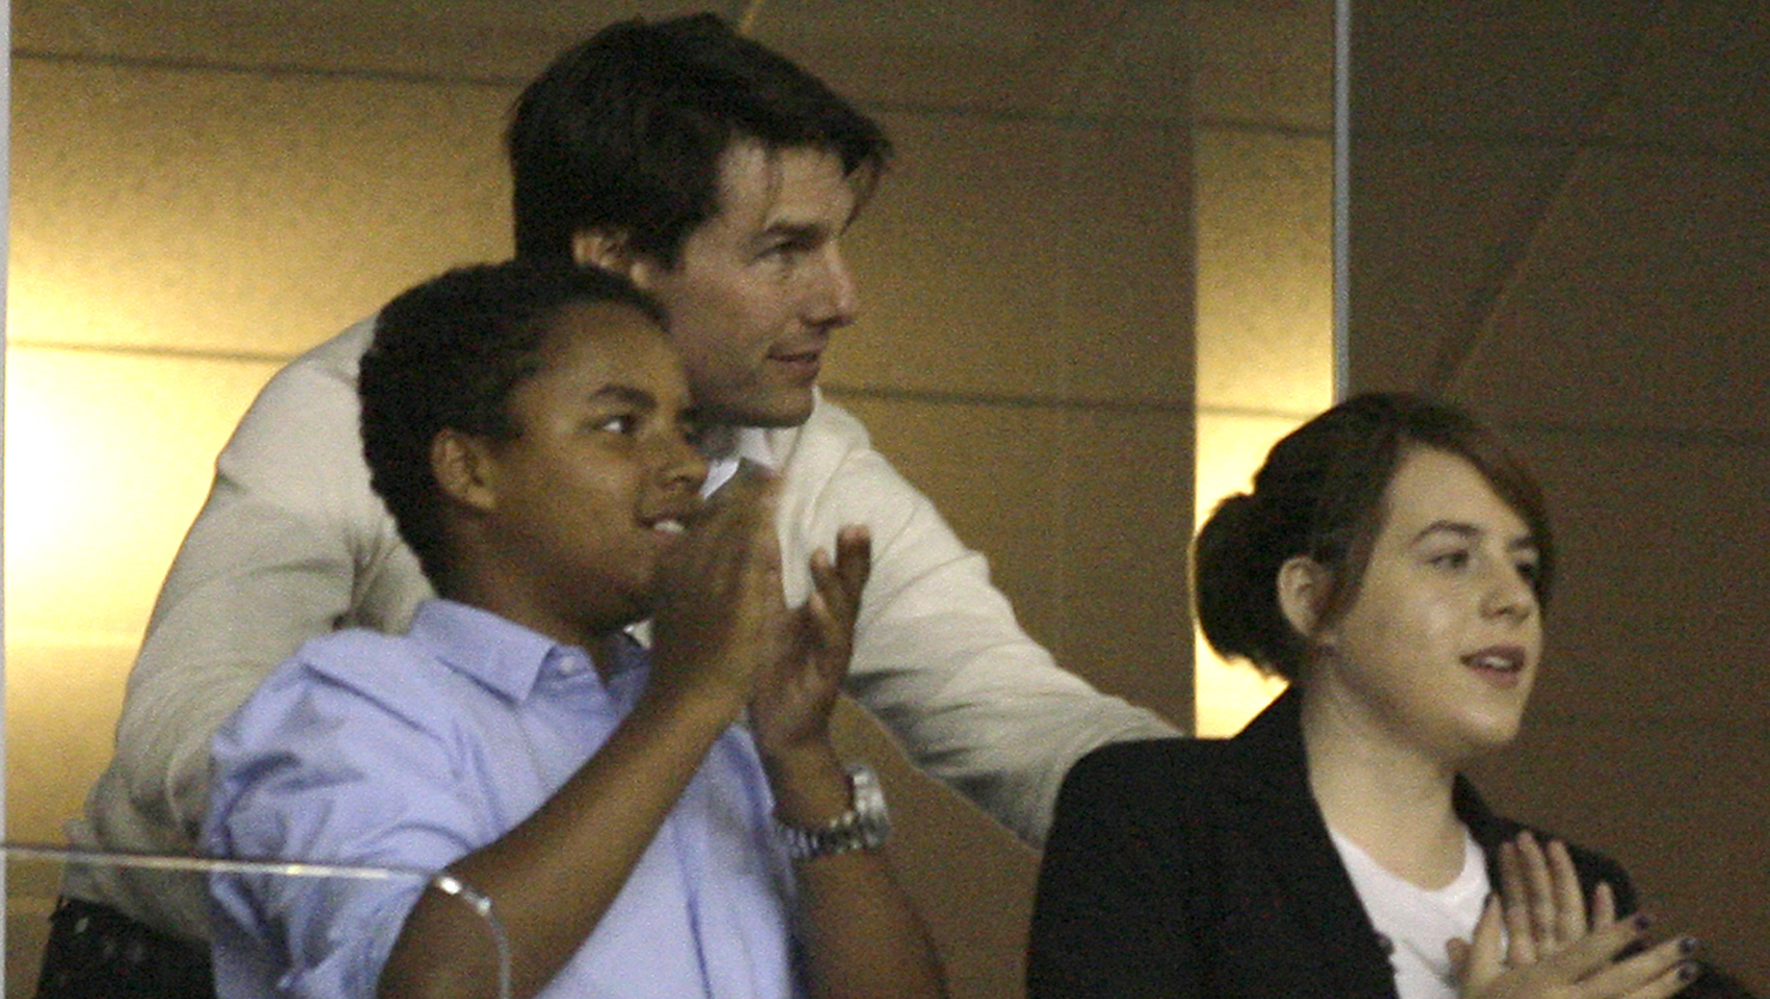 Tom Crusie Wedding.Bella Cruise Has Secret Wedding Without Tom Cruise Nicole Kidman